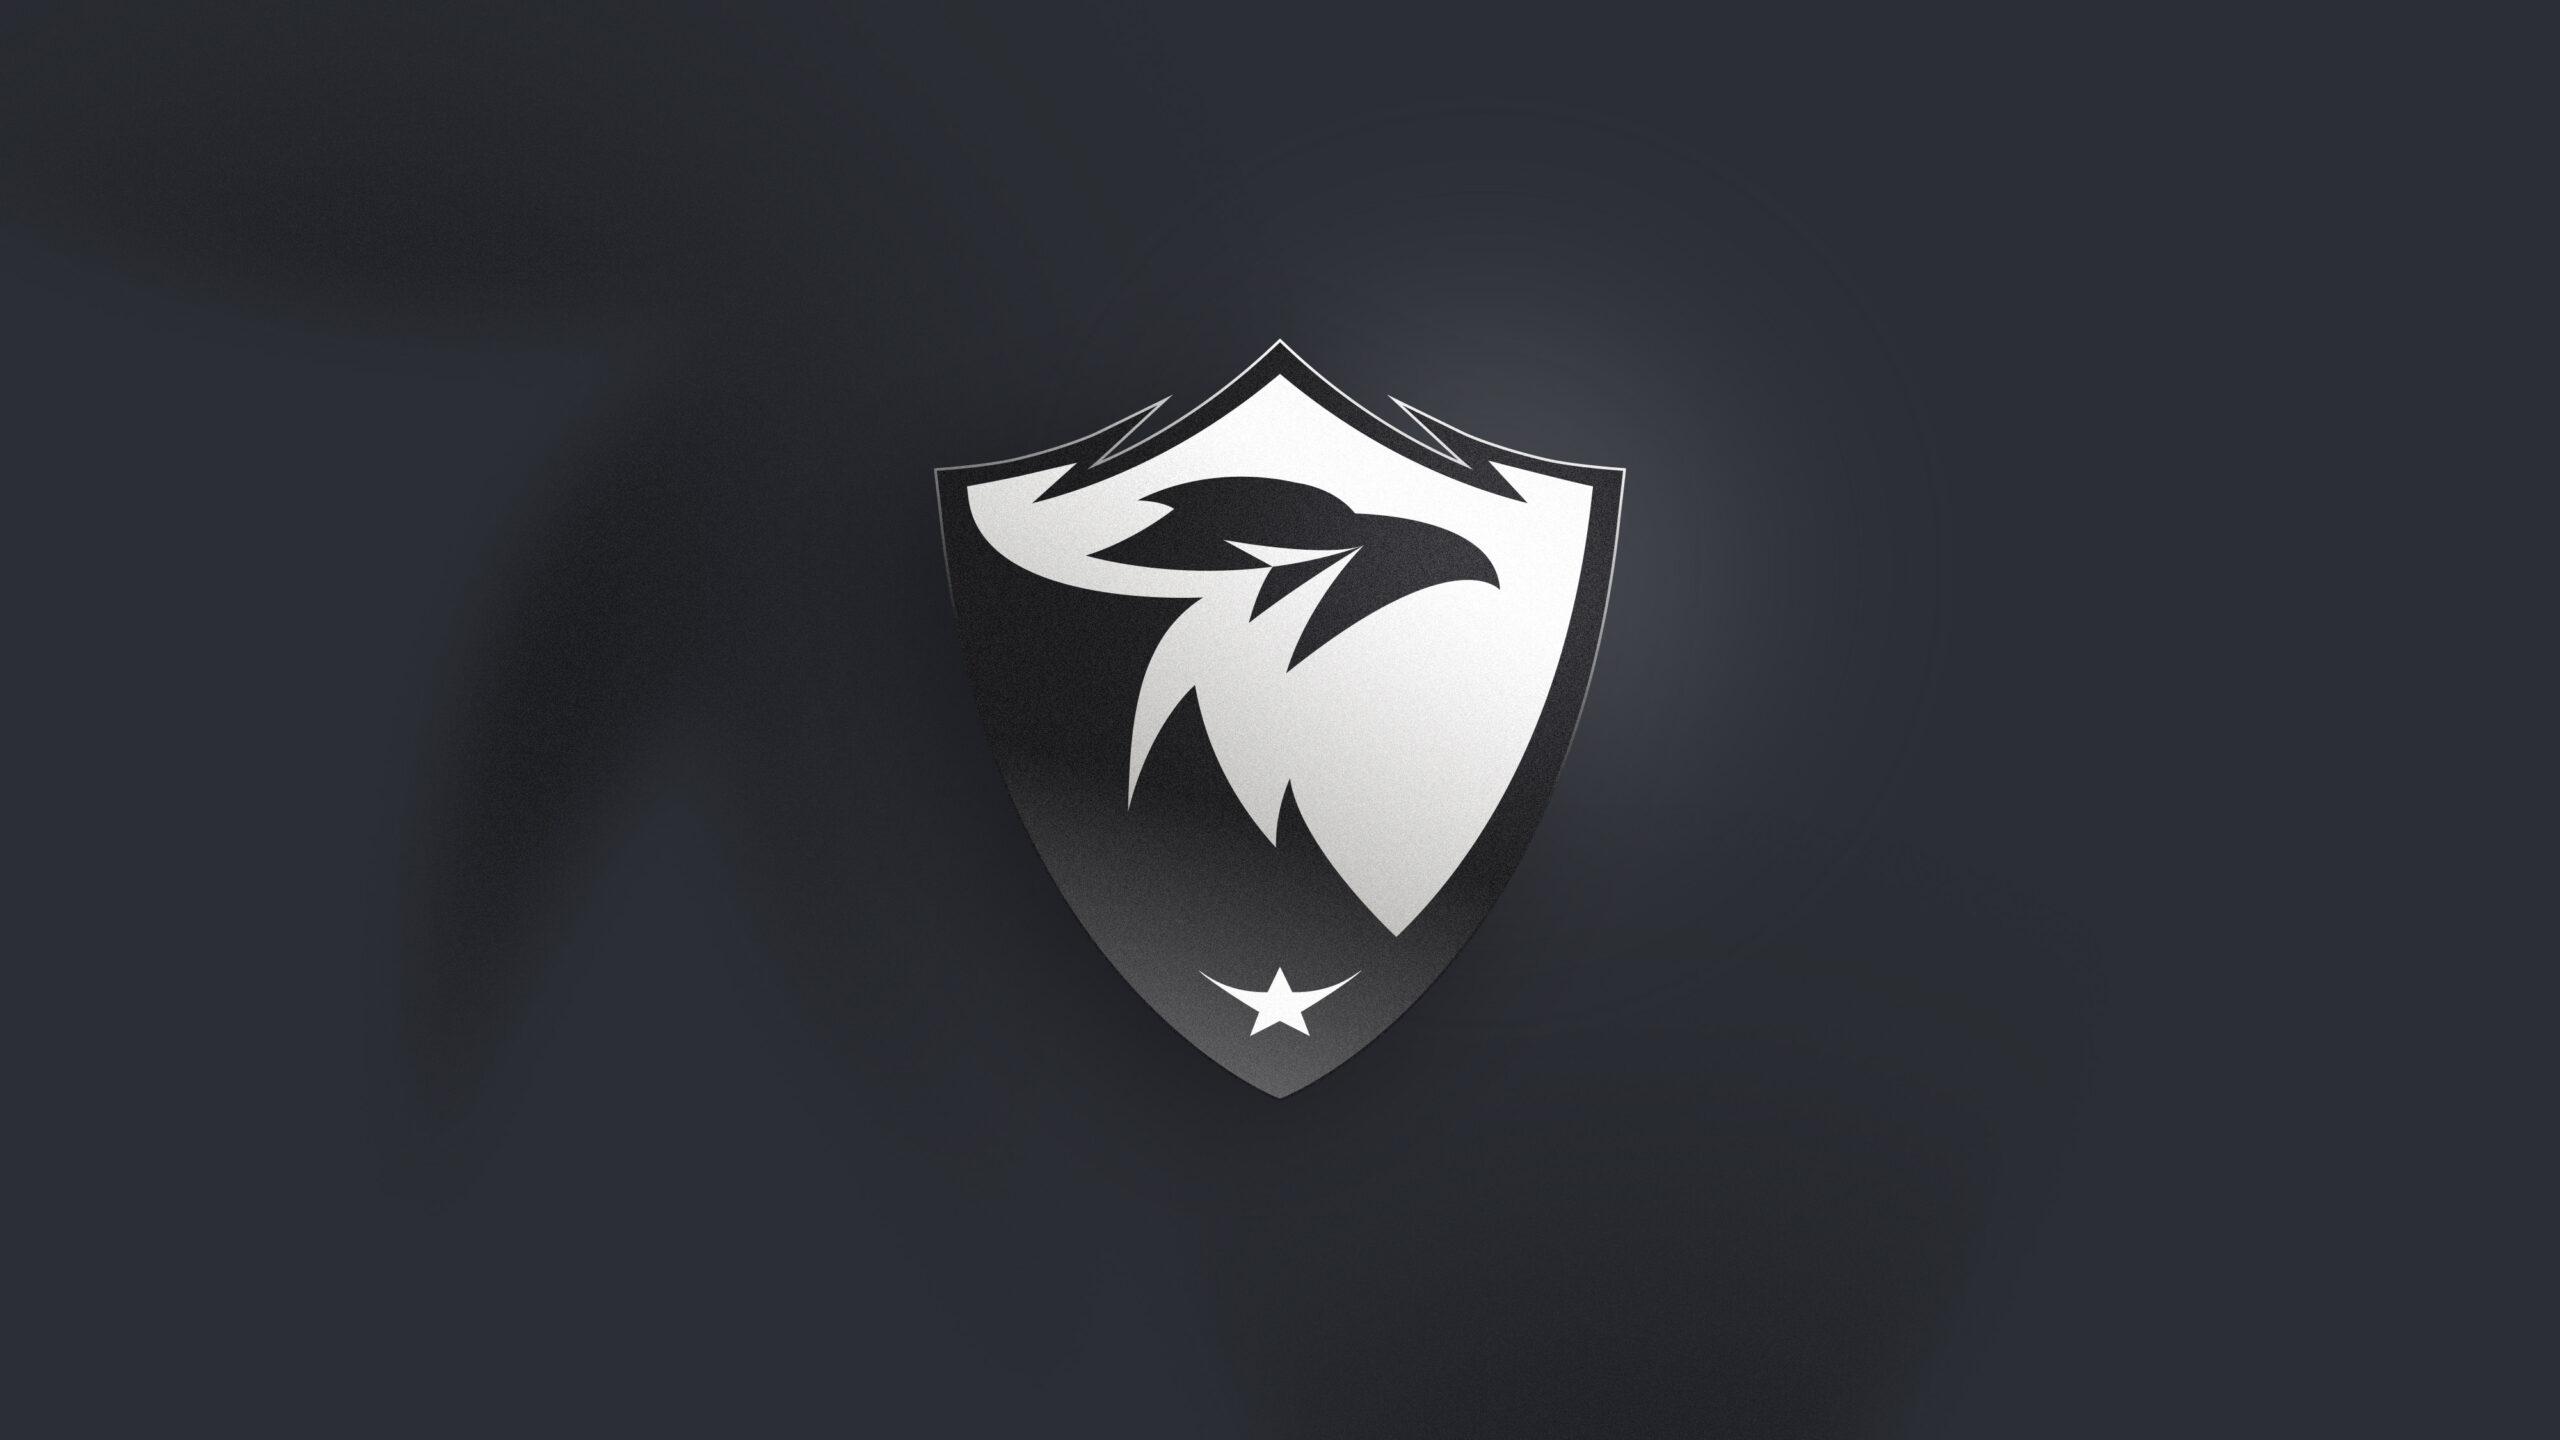 Nacione-Branding-Eagle-Sports-Analytics